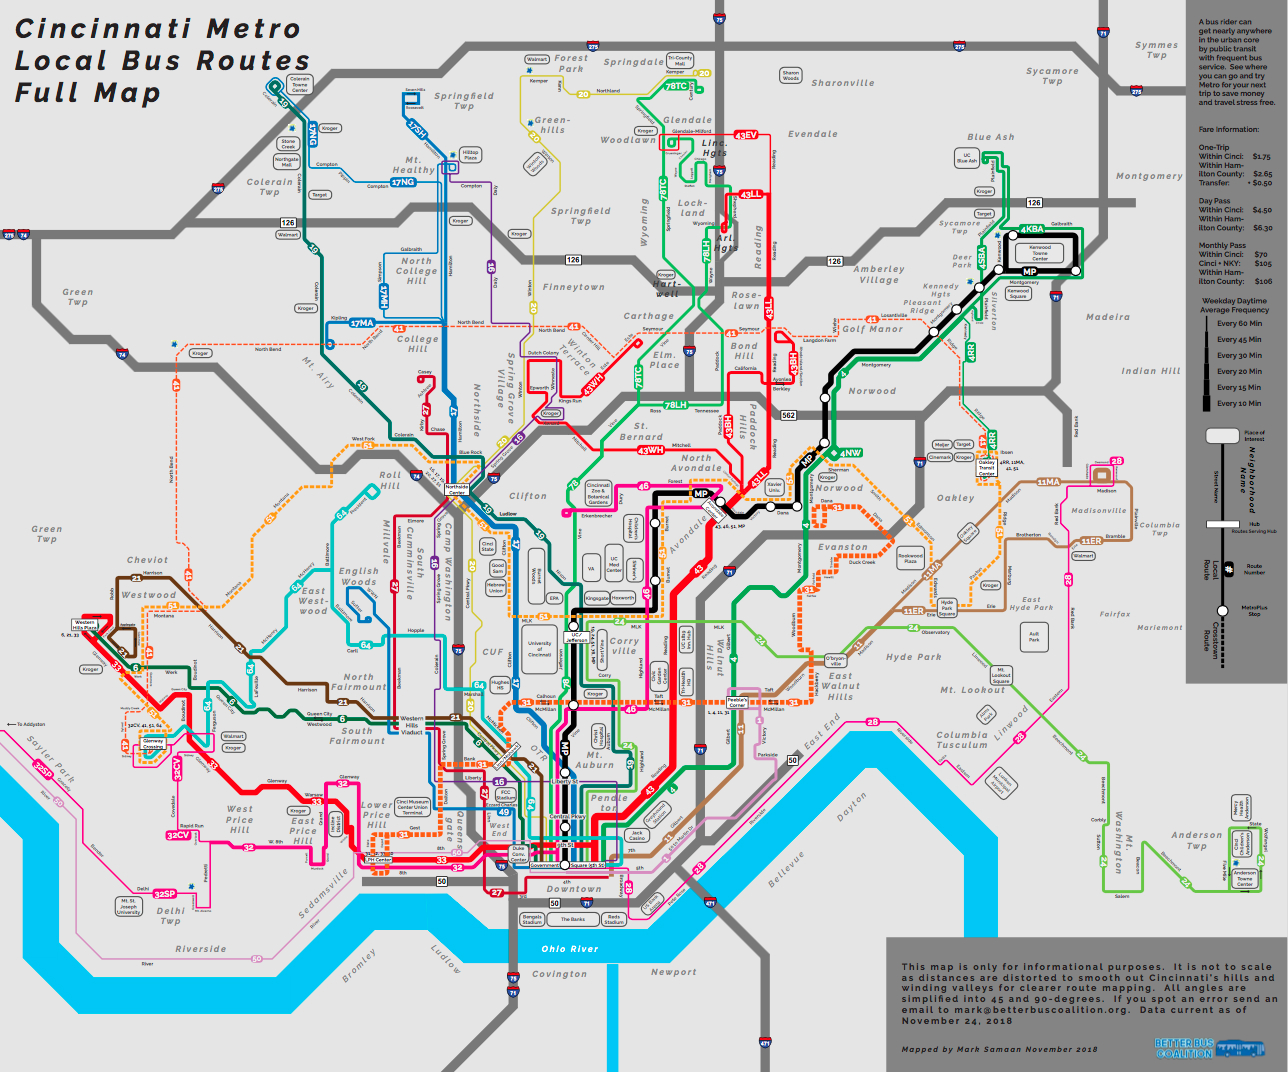 Cincinnati Subway Map.Better Bus Map Uses Modern Design To Make Metro Look Less Cluttered